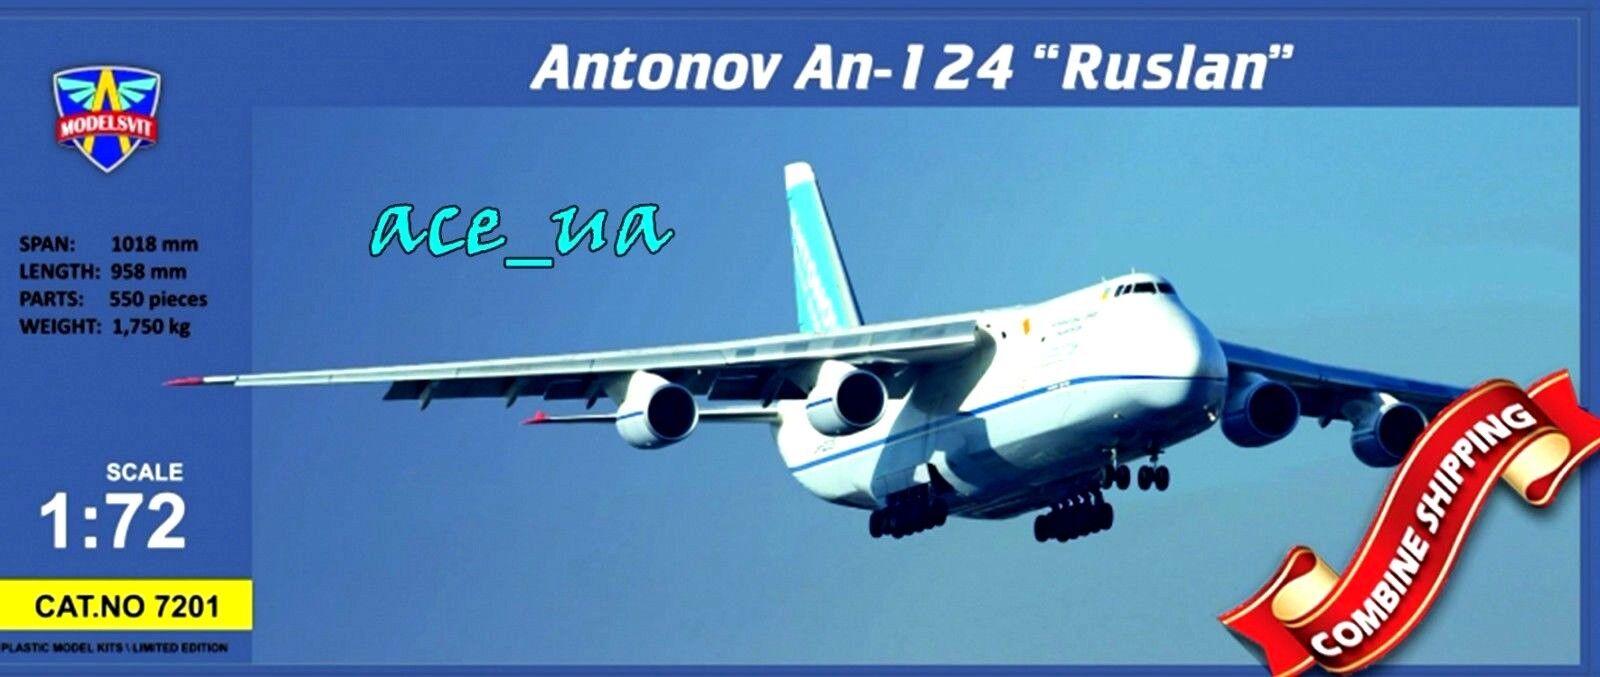 Modelsvit 7201 aviones de carga Antonov An--100 Ruslan Plastic Model Kit 172